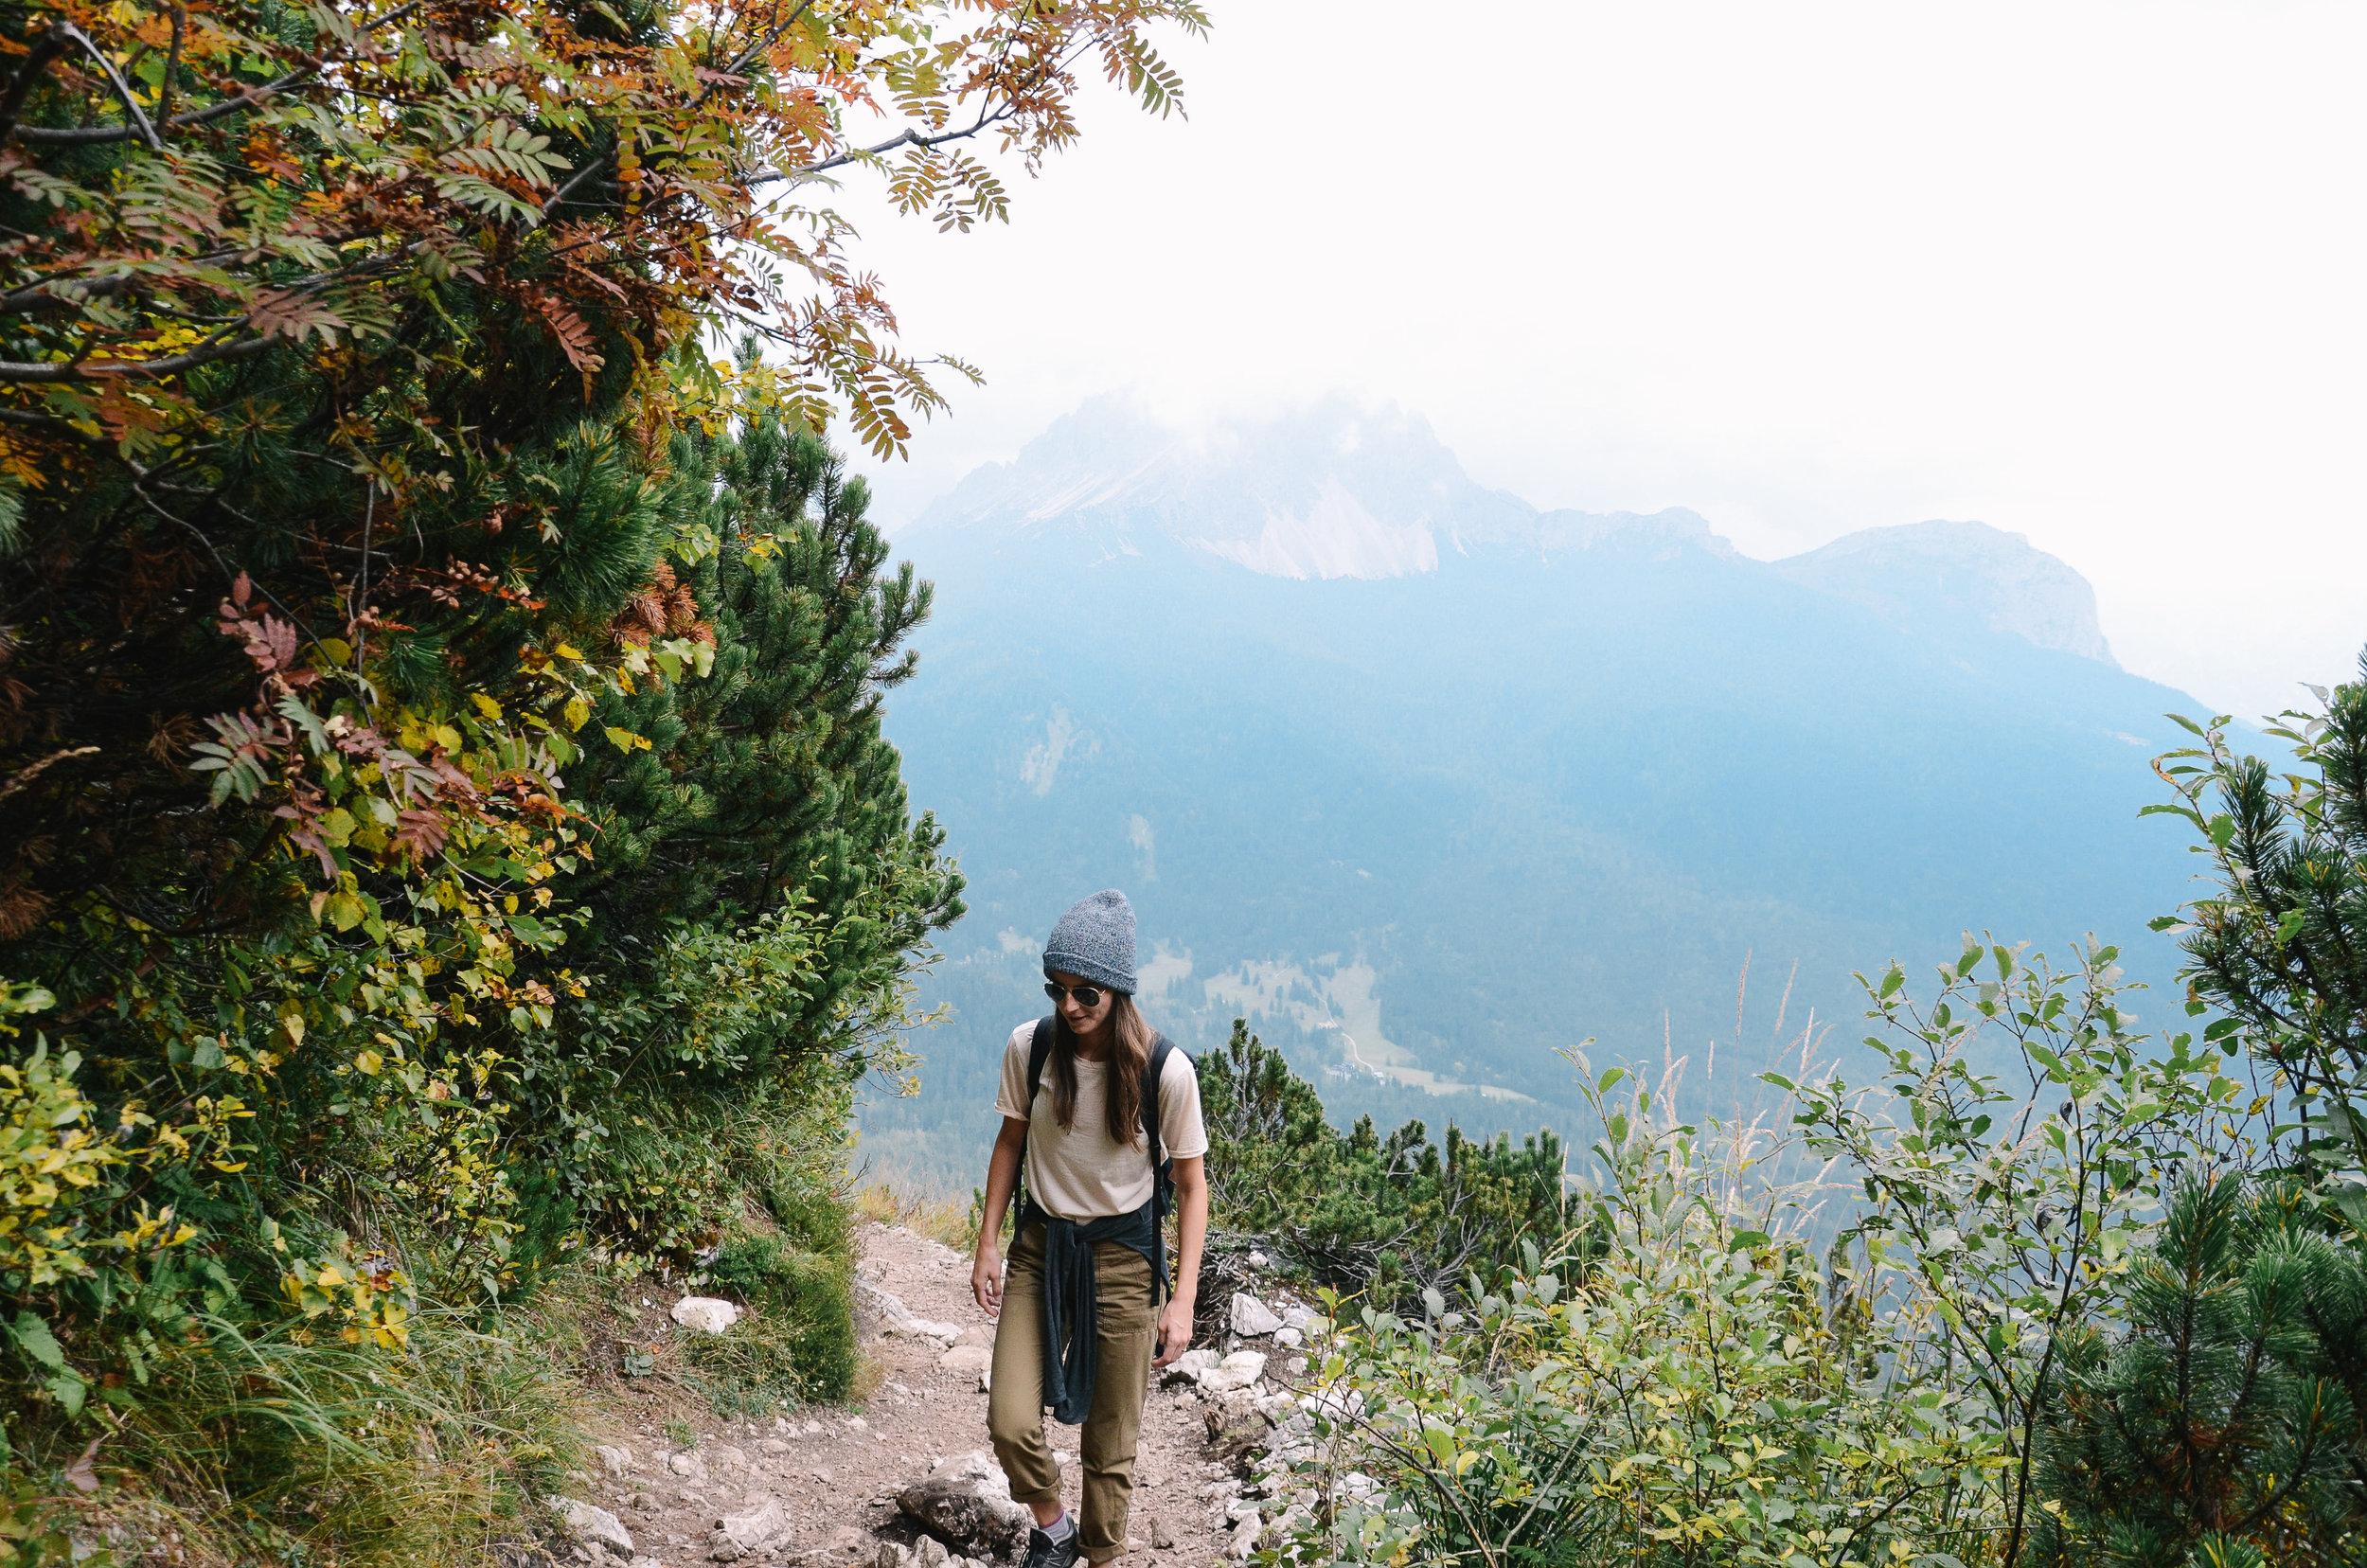 adventure-in-italy-3-hikes-dolomites-hiking-travel-blog-tyrol-20.jpg